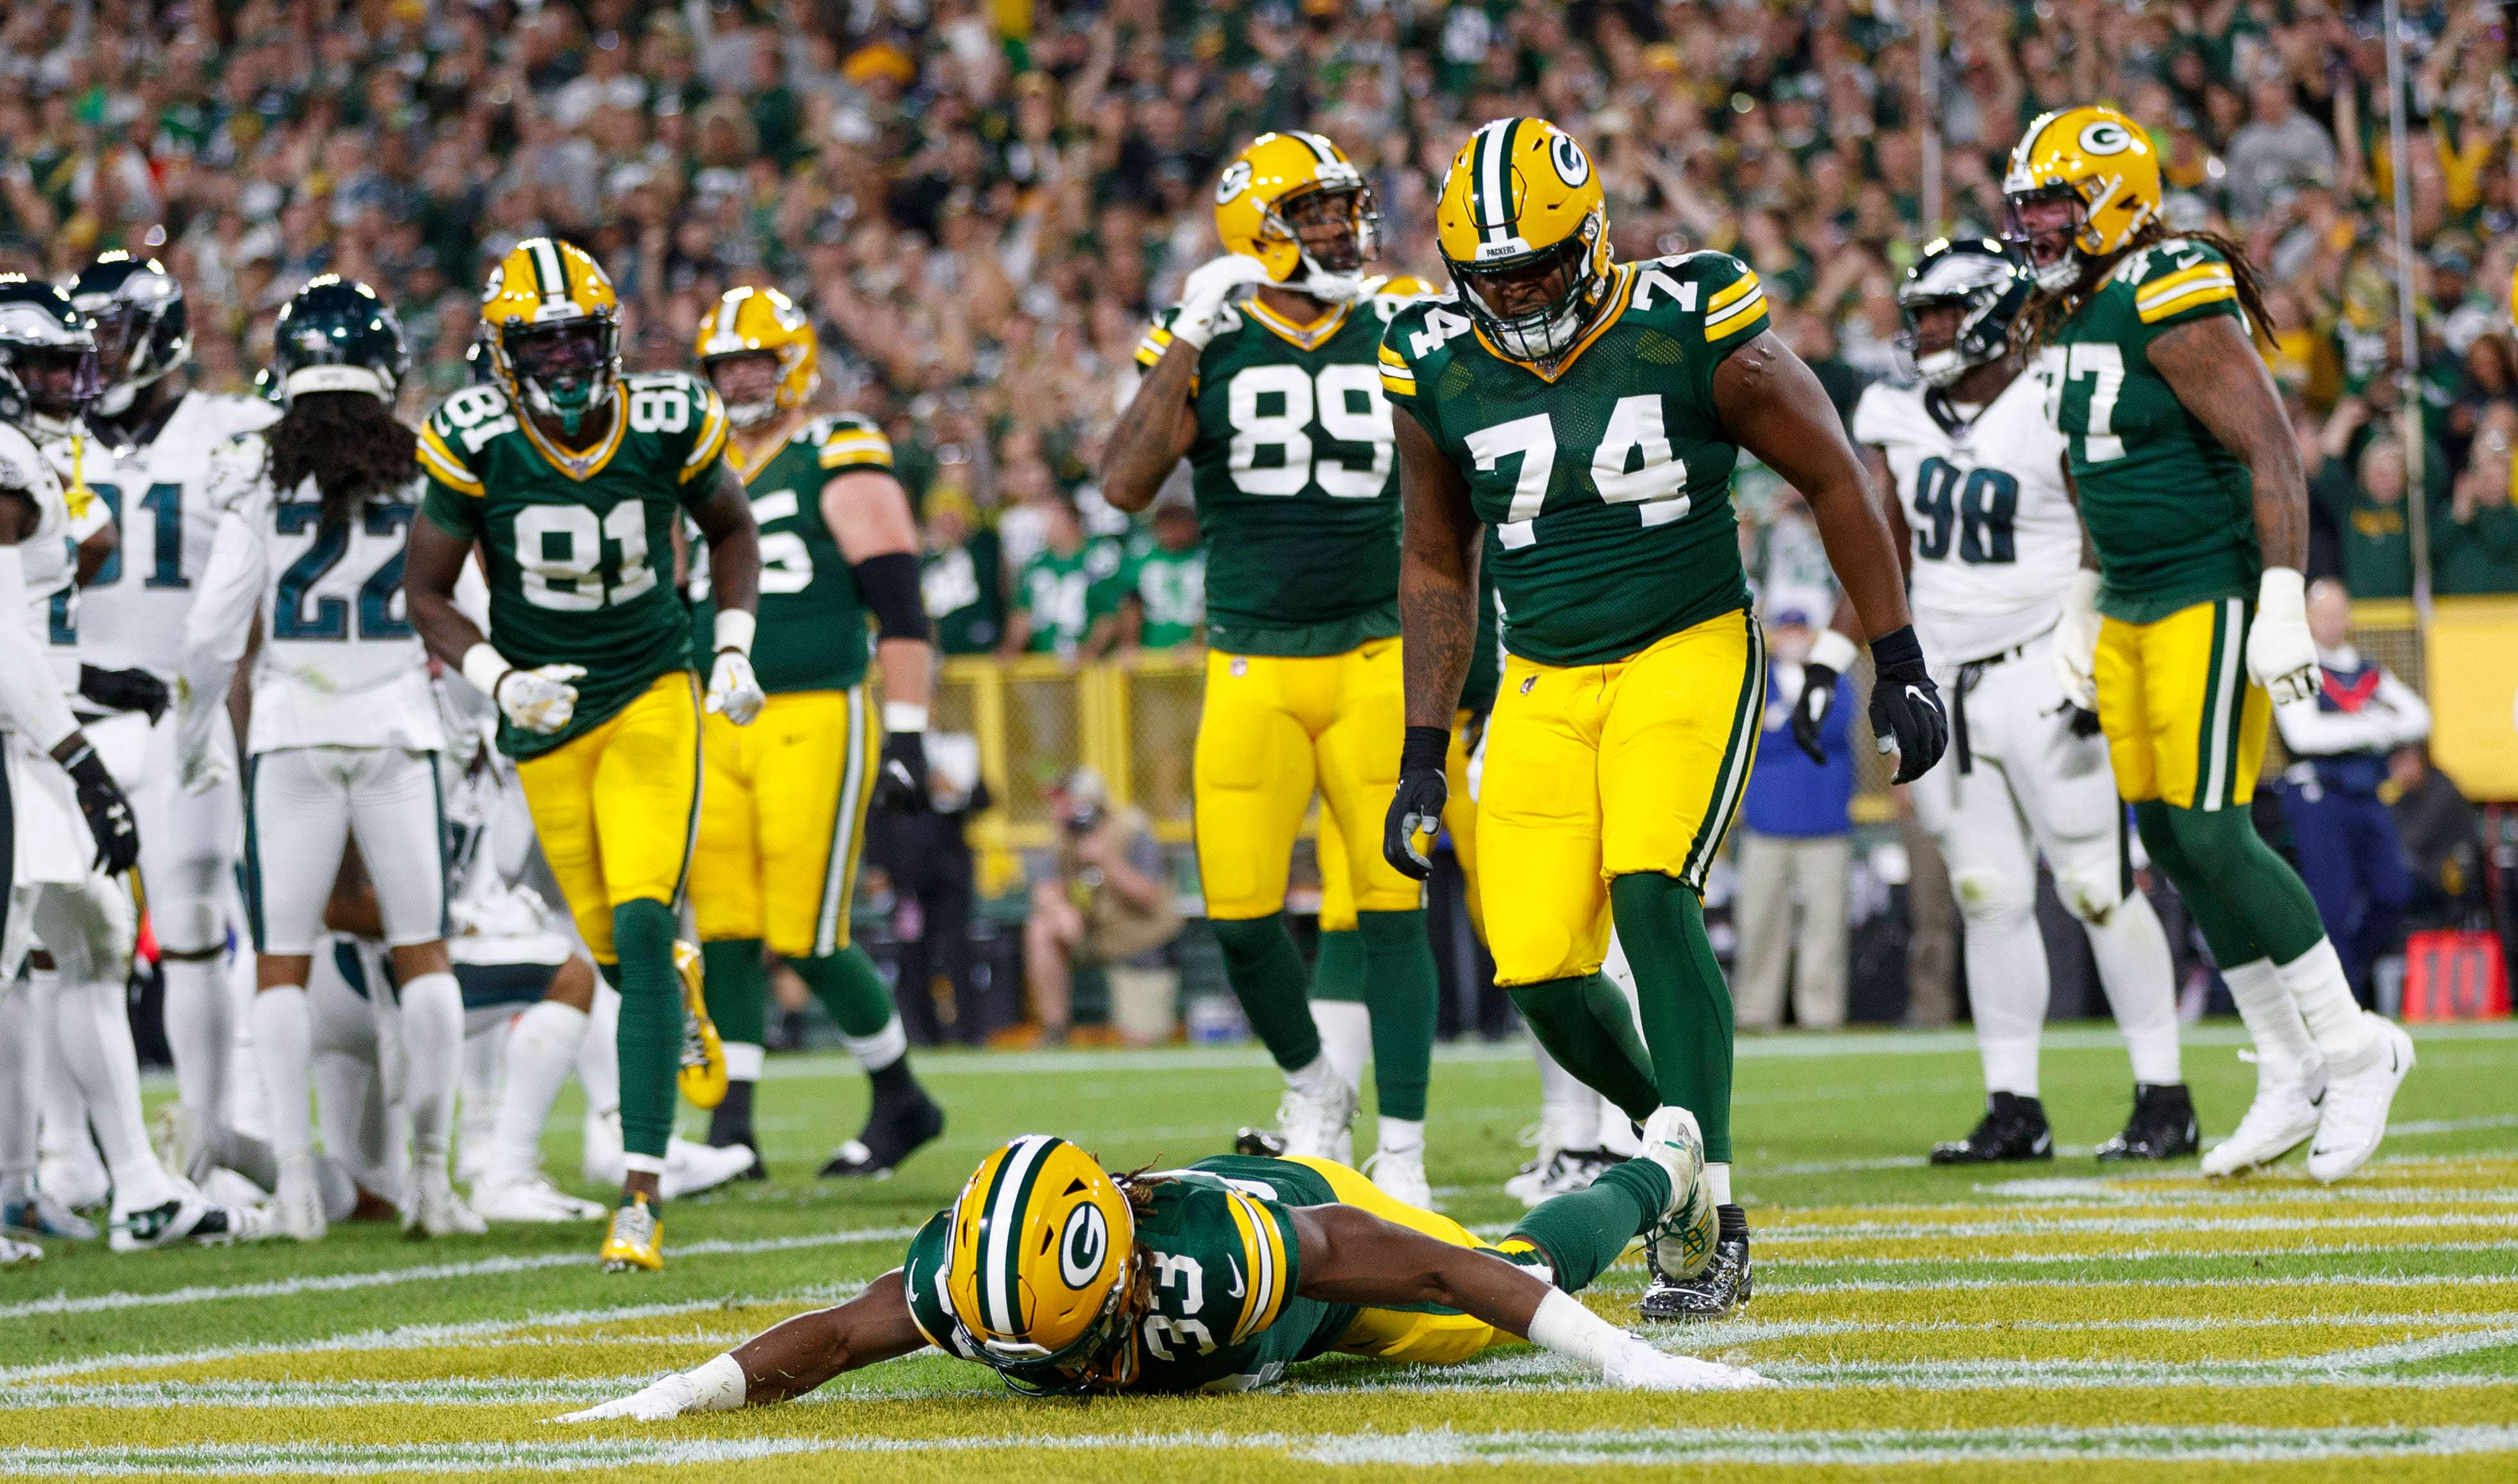 Fotos da semana 4 da NFL